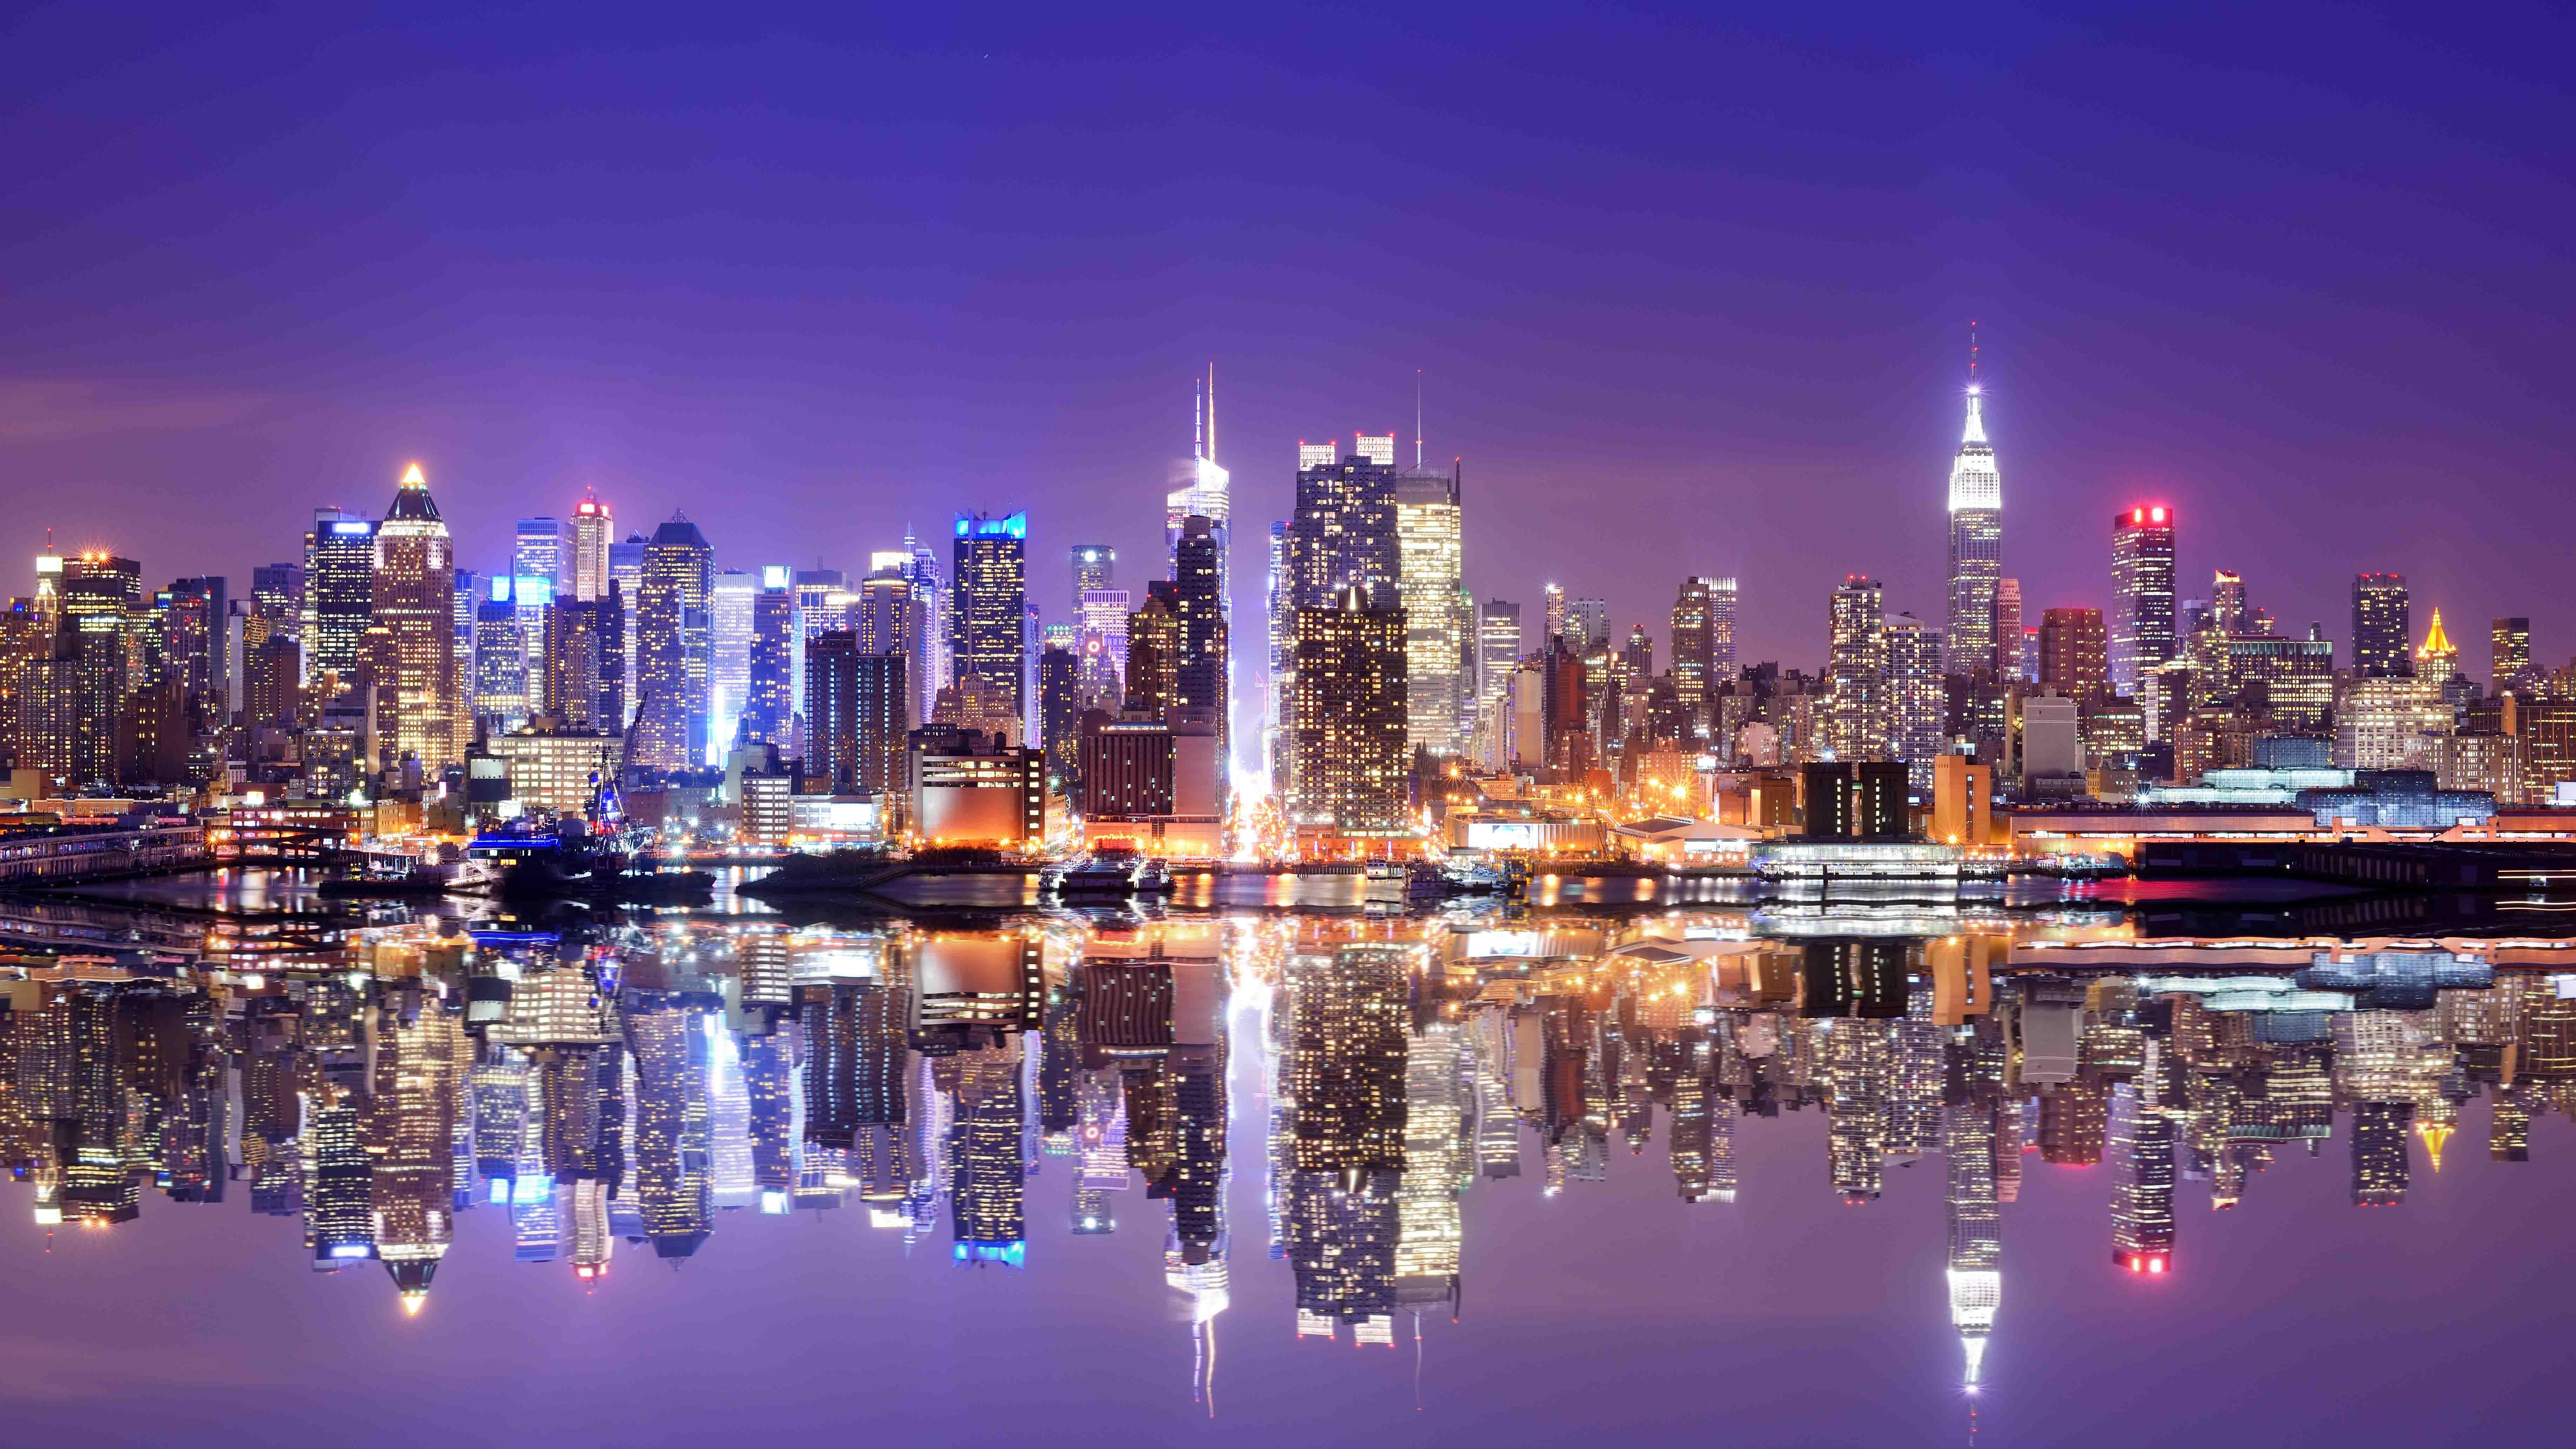 C0301105SSK_139655807  New York.jpg